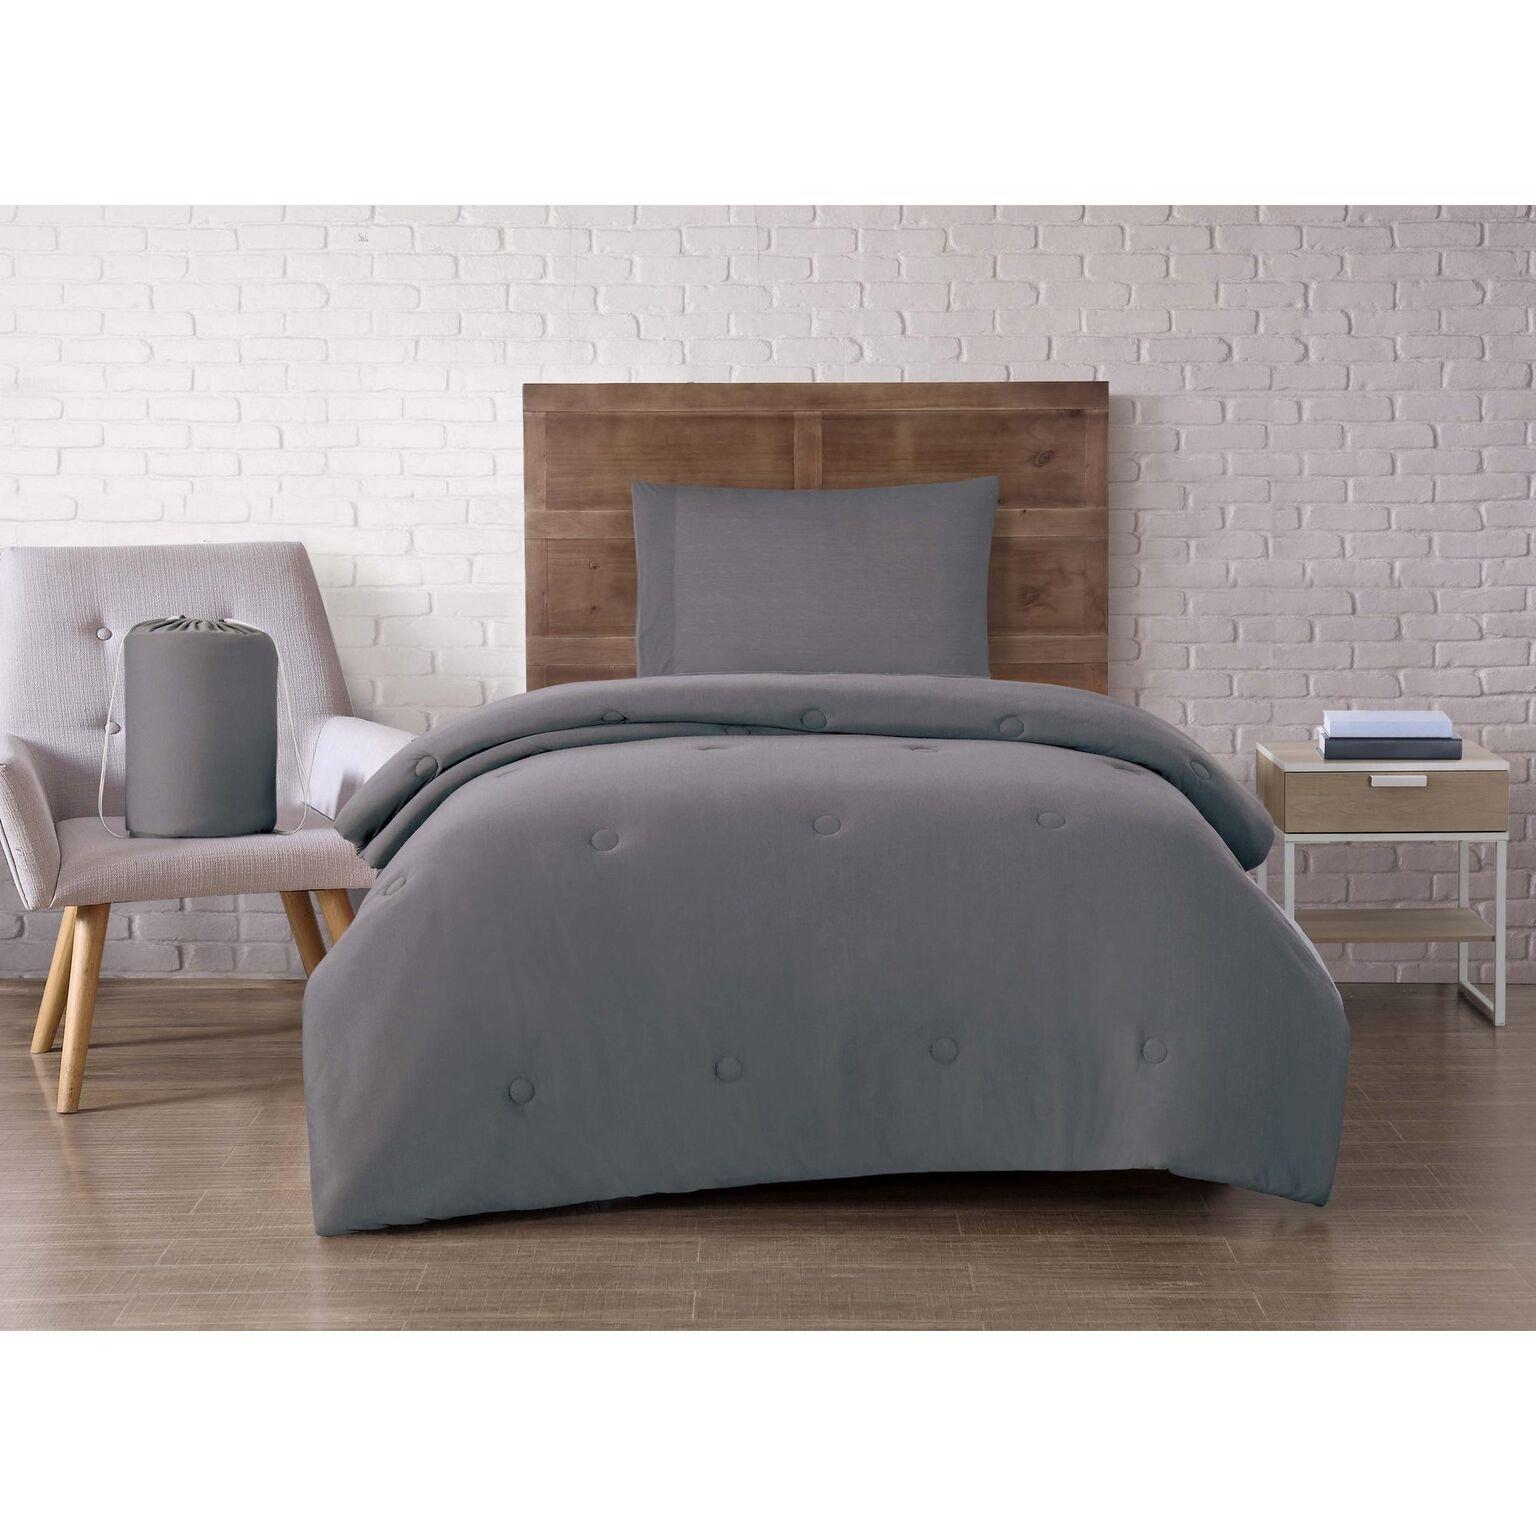 Brooklyn Loom CS2424CGTX4-00 Dorm Set, Twin XL, Charcoal